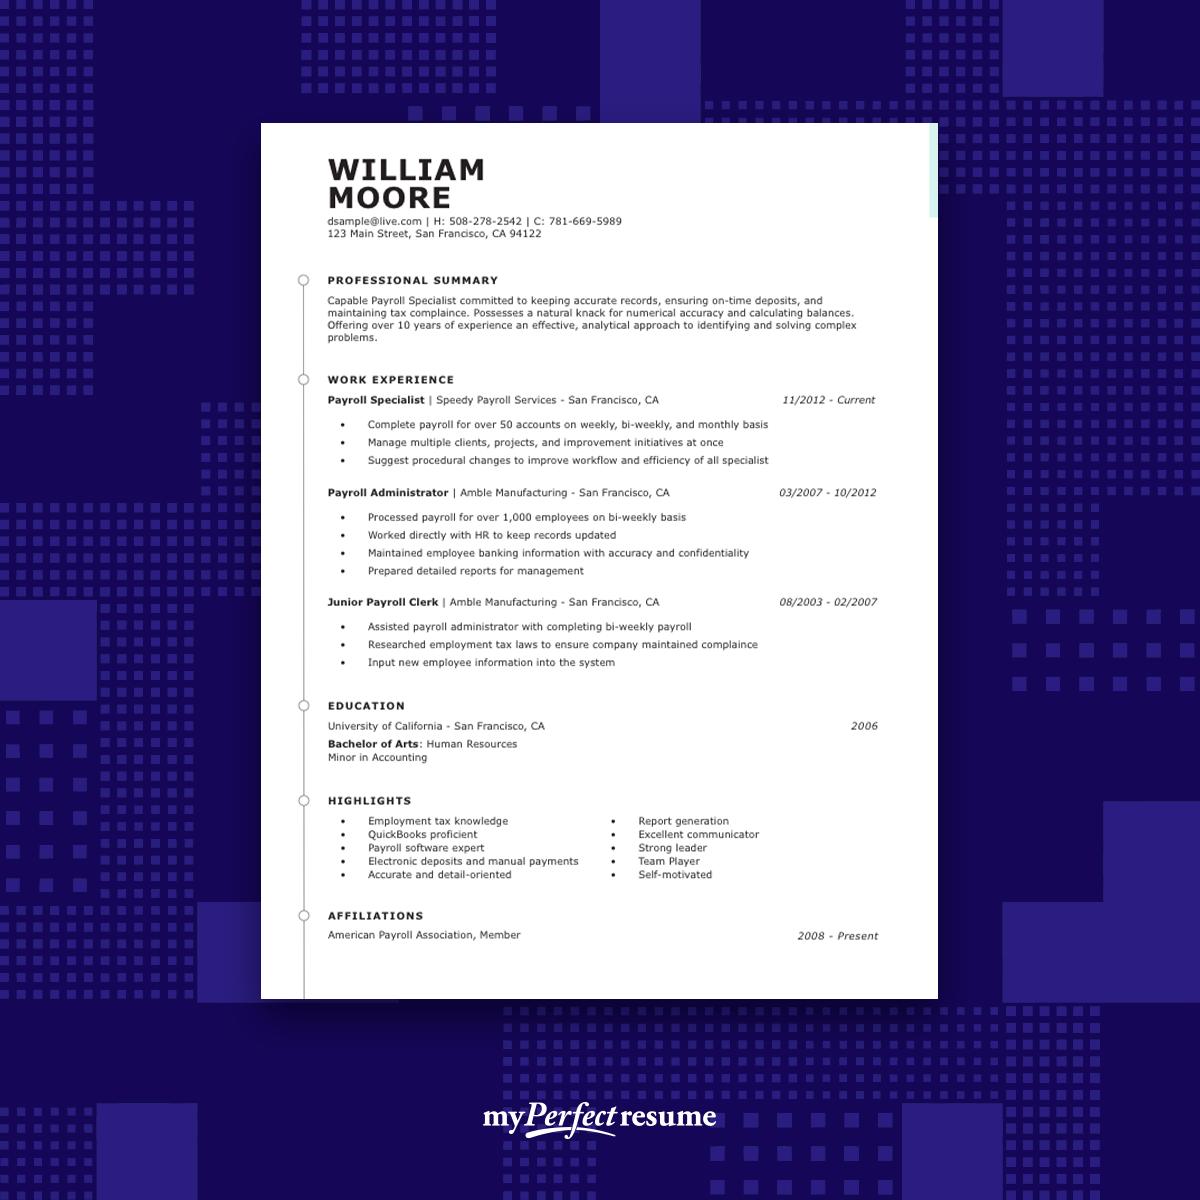 Resume Templates in 2020 Job resume examples, Resume